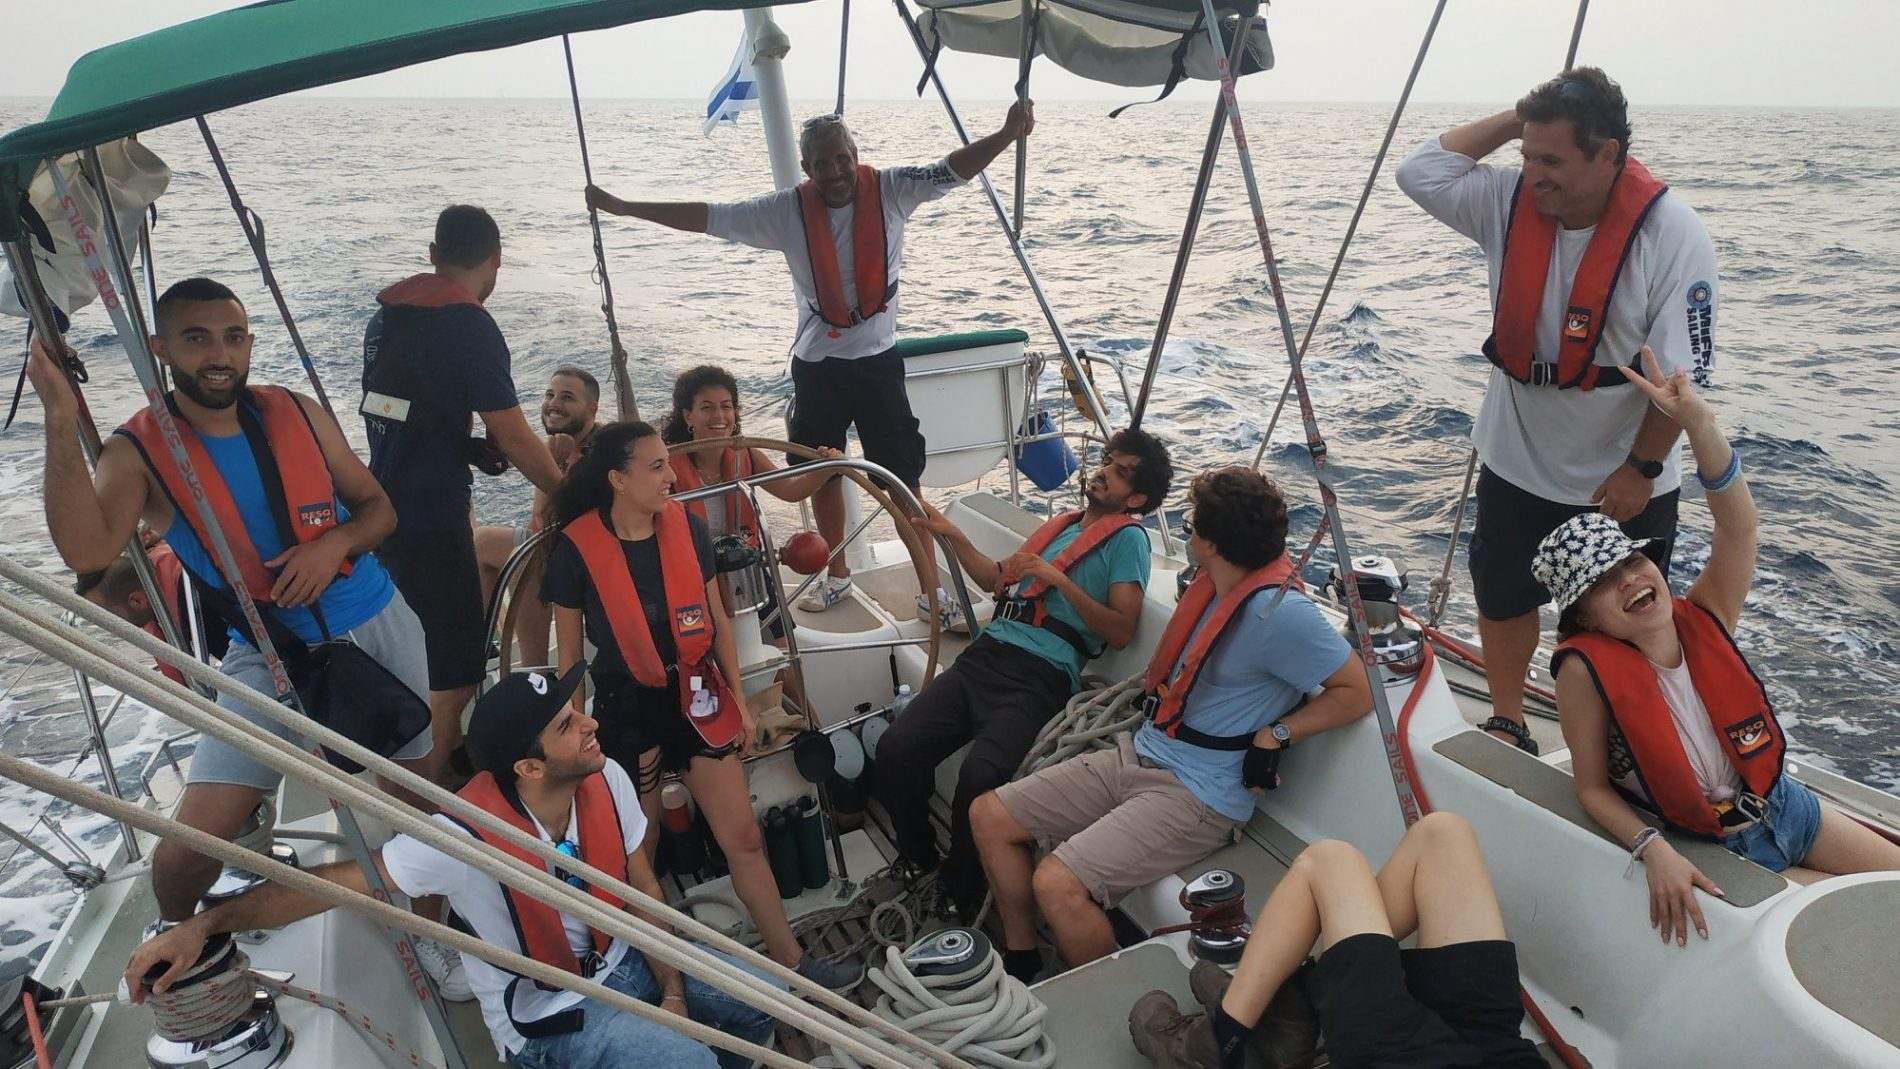 Intercultural Awareness on the Open Seas